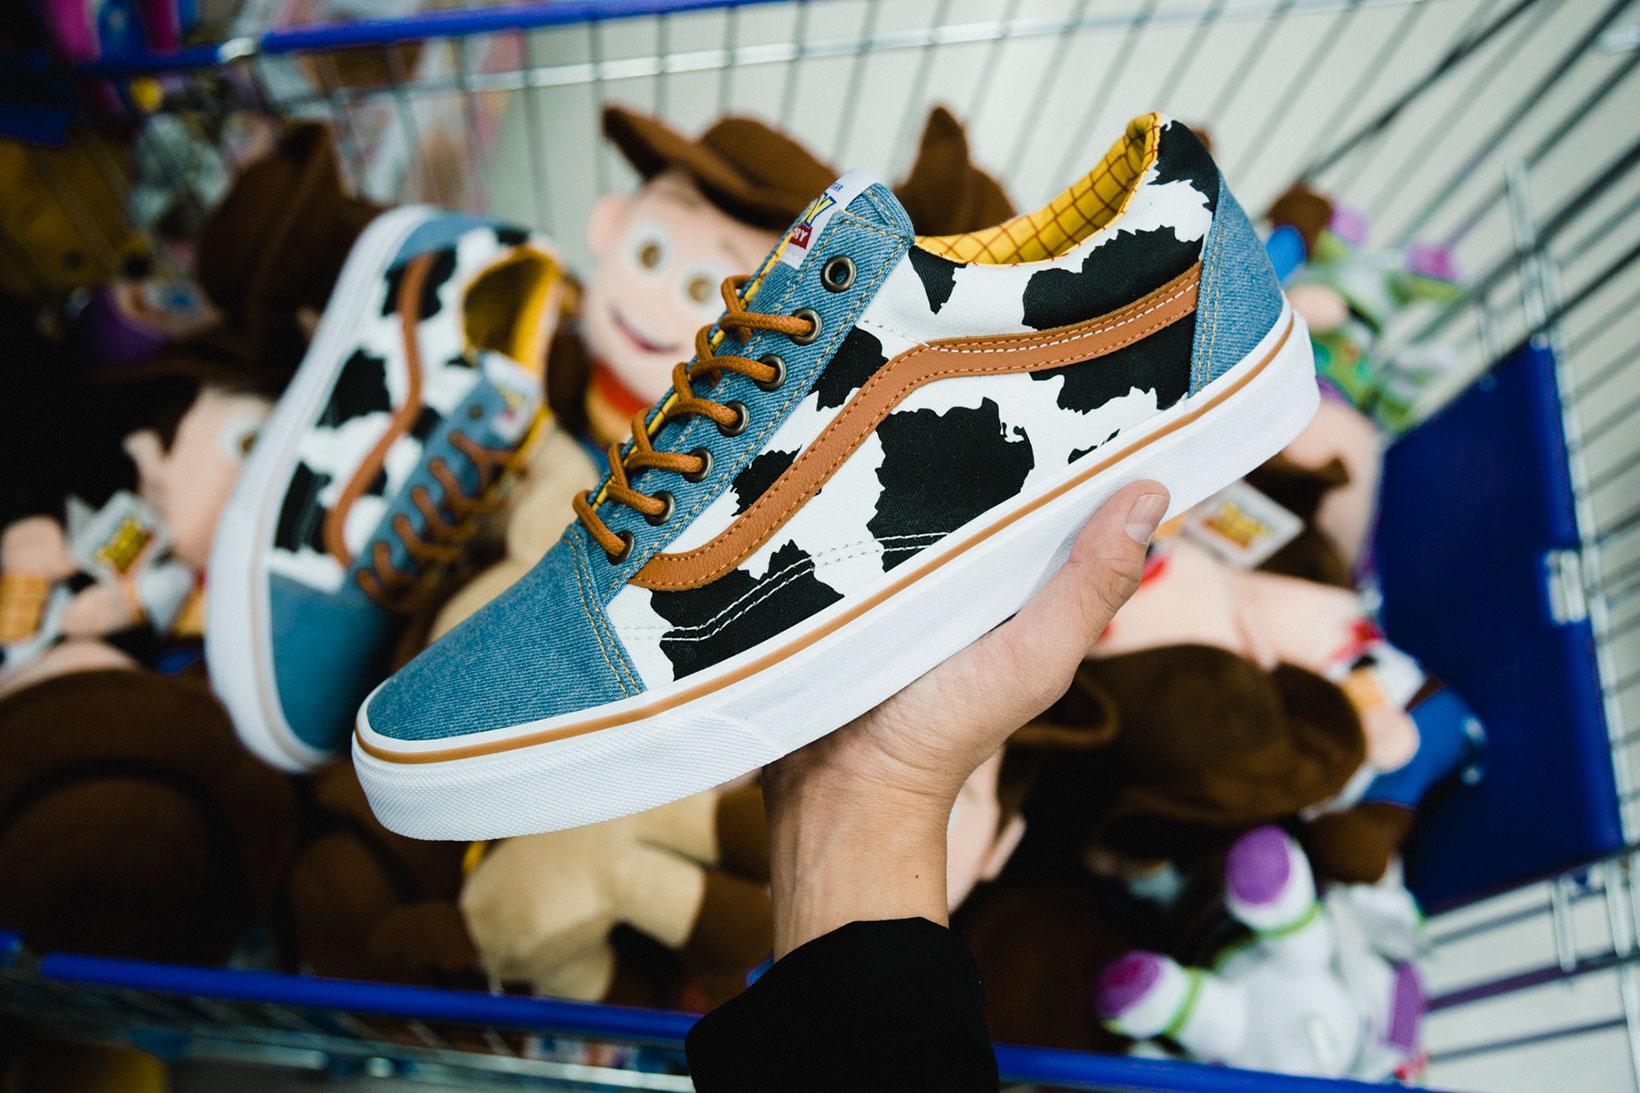 Toy Story Vans Sneakers Woody Buzz Lightyear Disney - 1765052